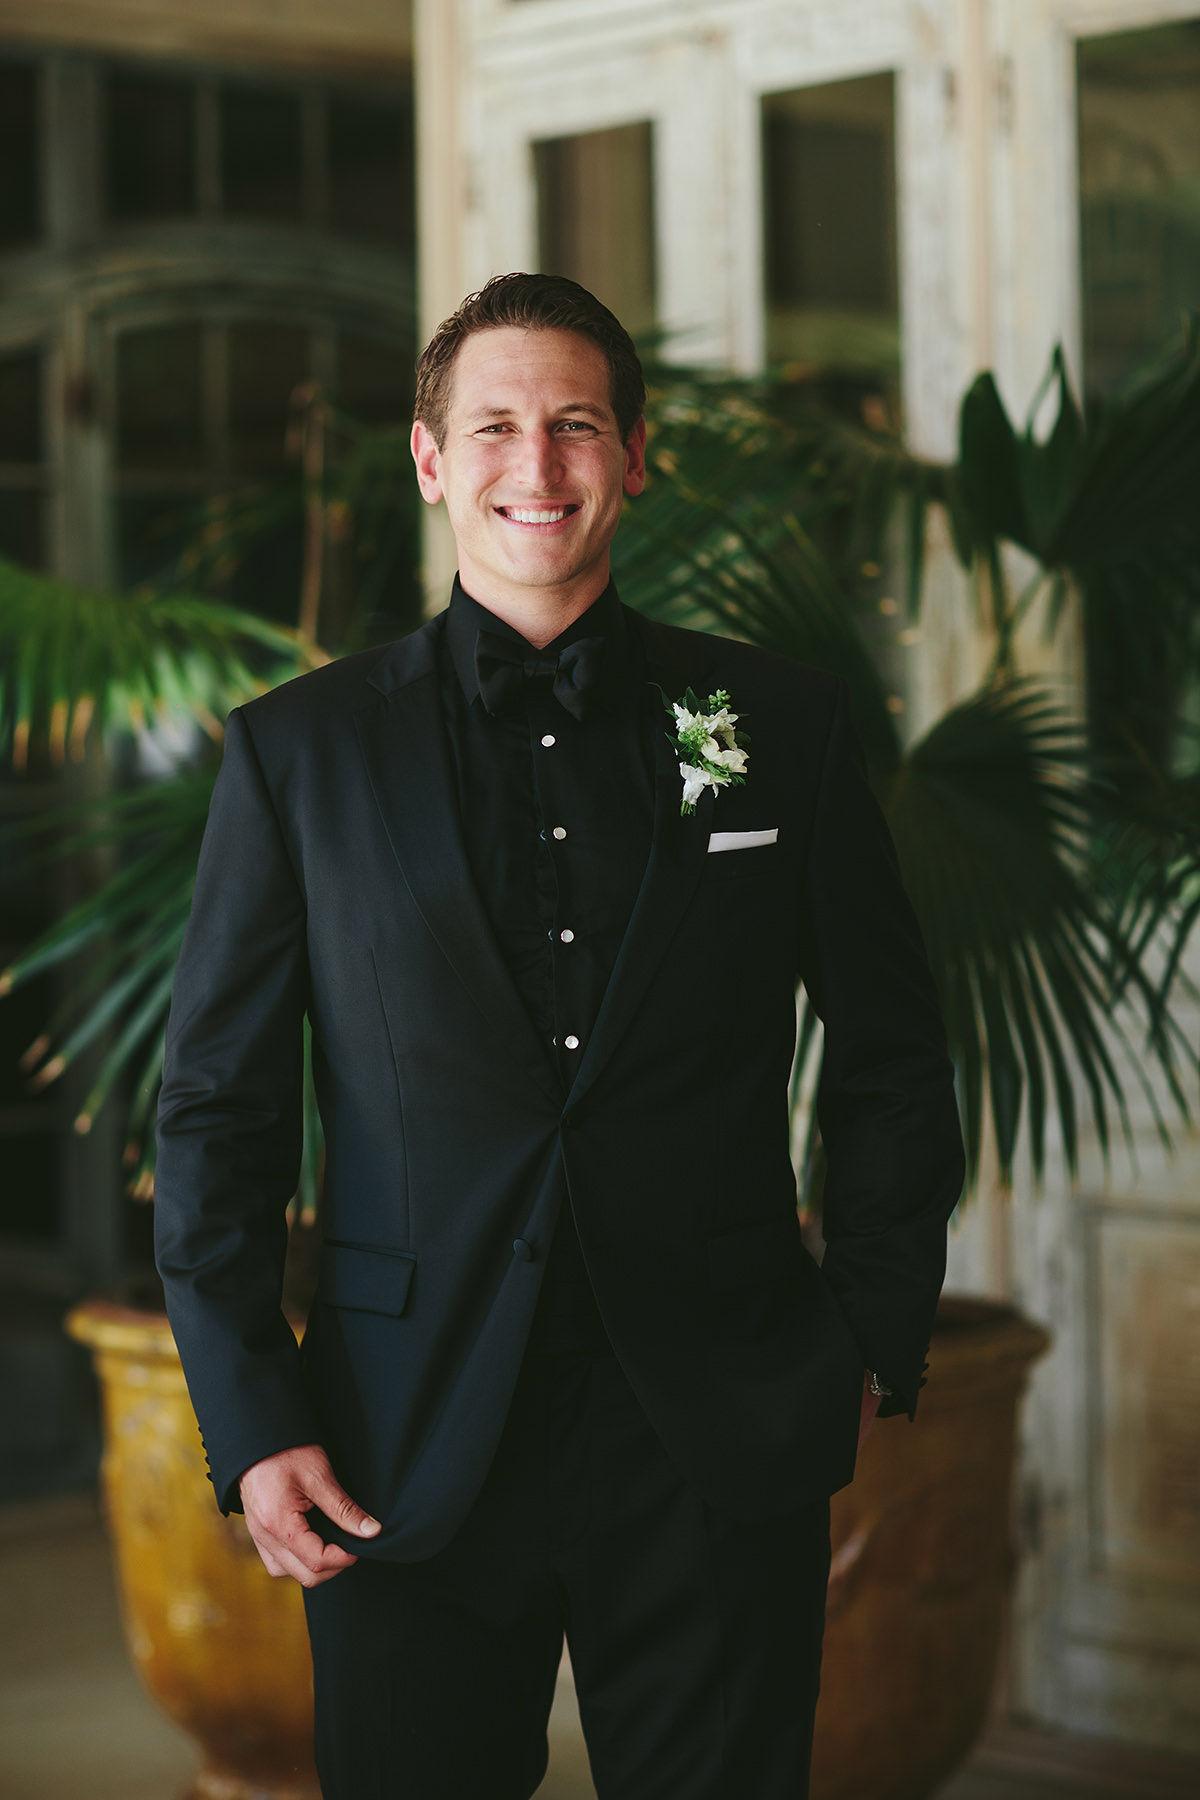 sarah daniel wedding groom in black suit